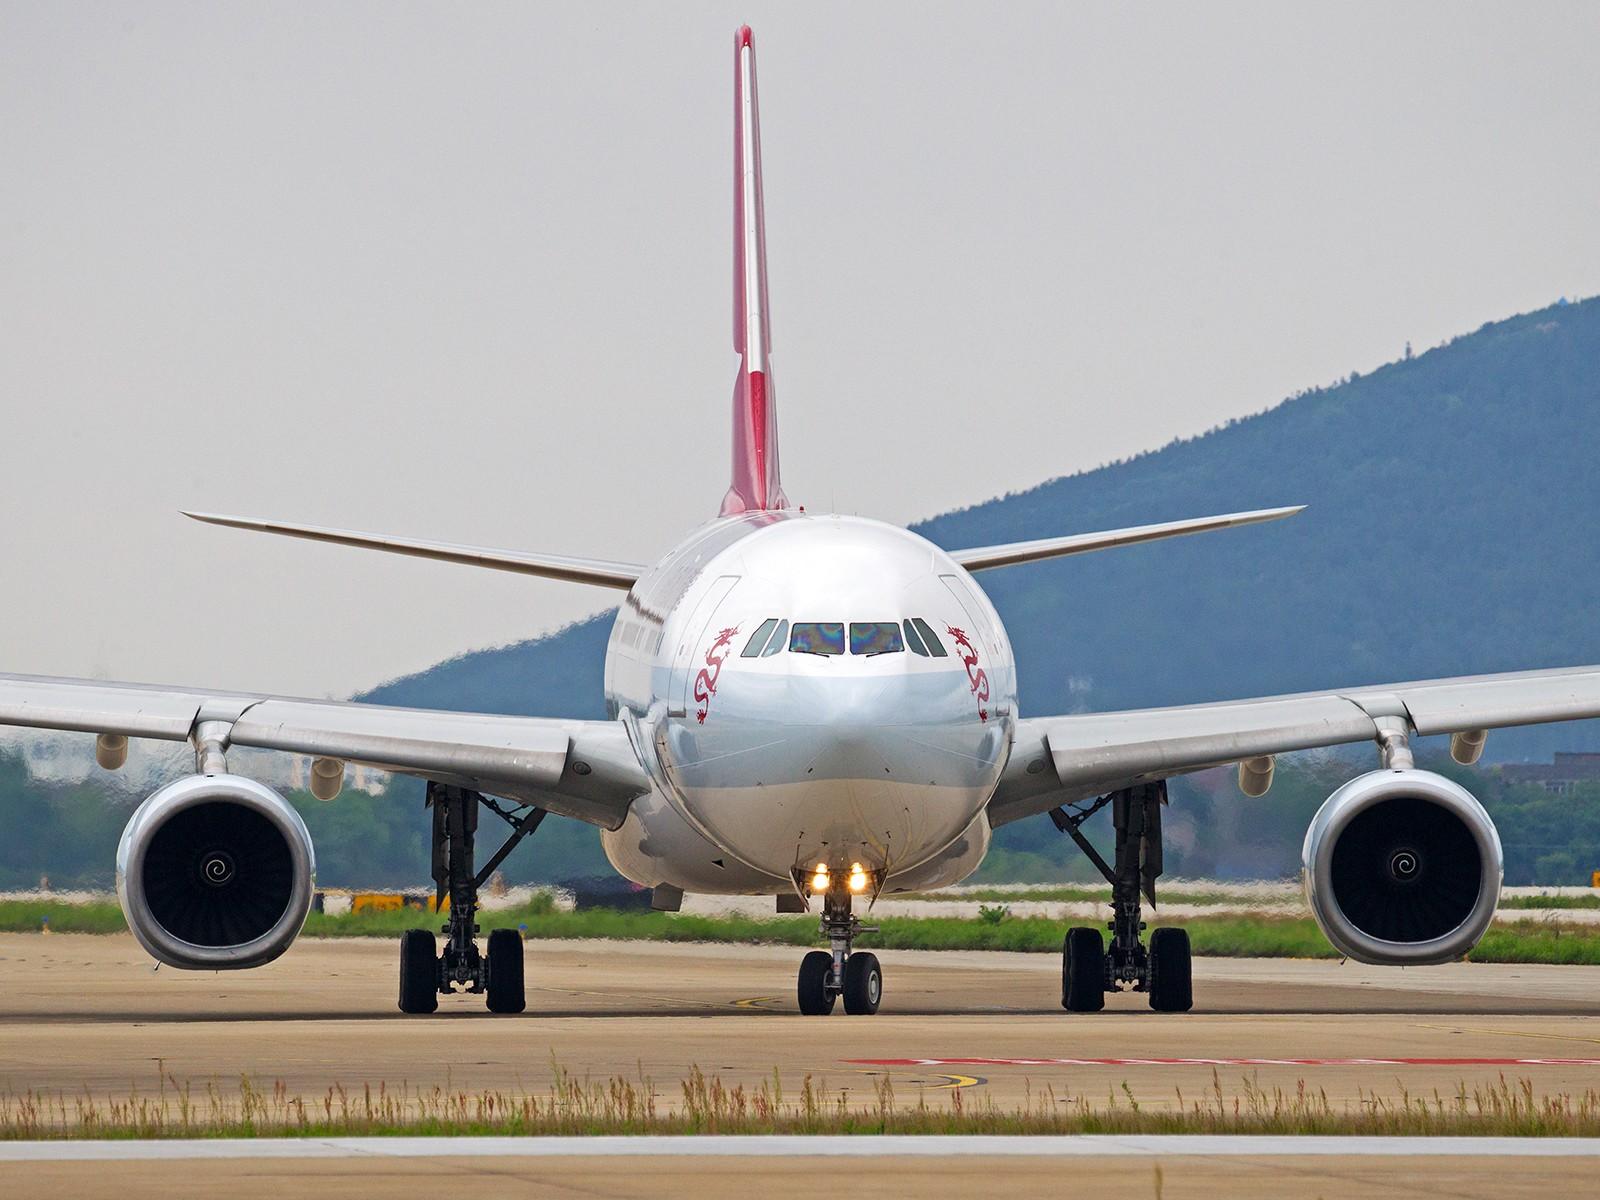 "Re:[原创][BLDDQ]******NKG带血的""鱼翅""----今天就它落地到起飞那三小时大雨停了****** AIRBUS A330-300 B-HYQ 中国南京禄口国际机场"